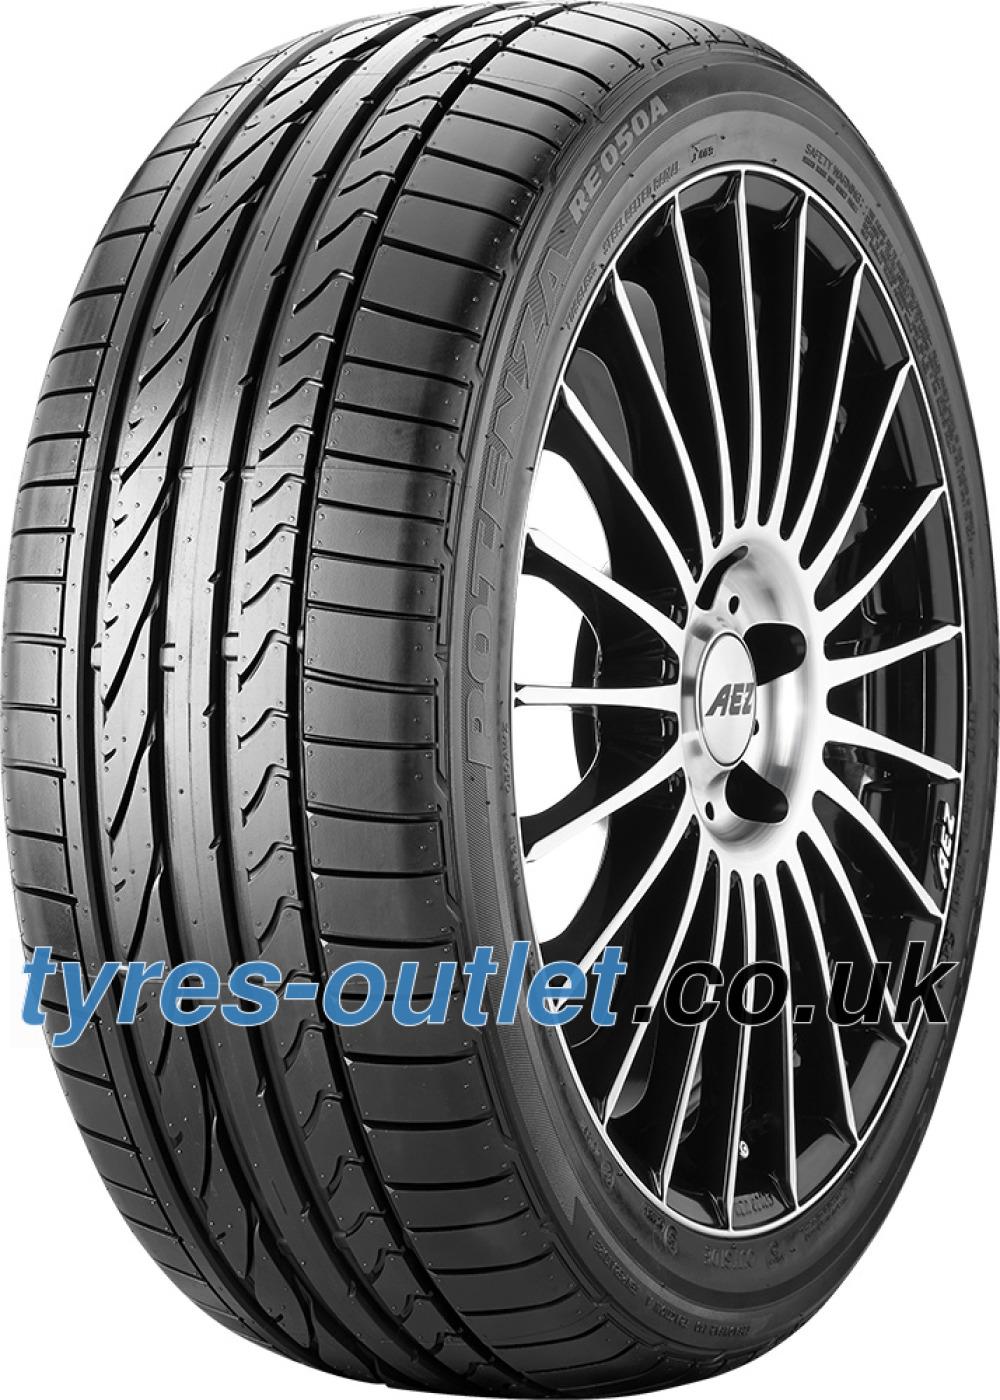 Bridgestone Potenza RE 050 A ( 205/45 R17 88V XL with rim protection (MFS) )